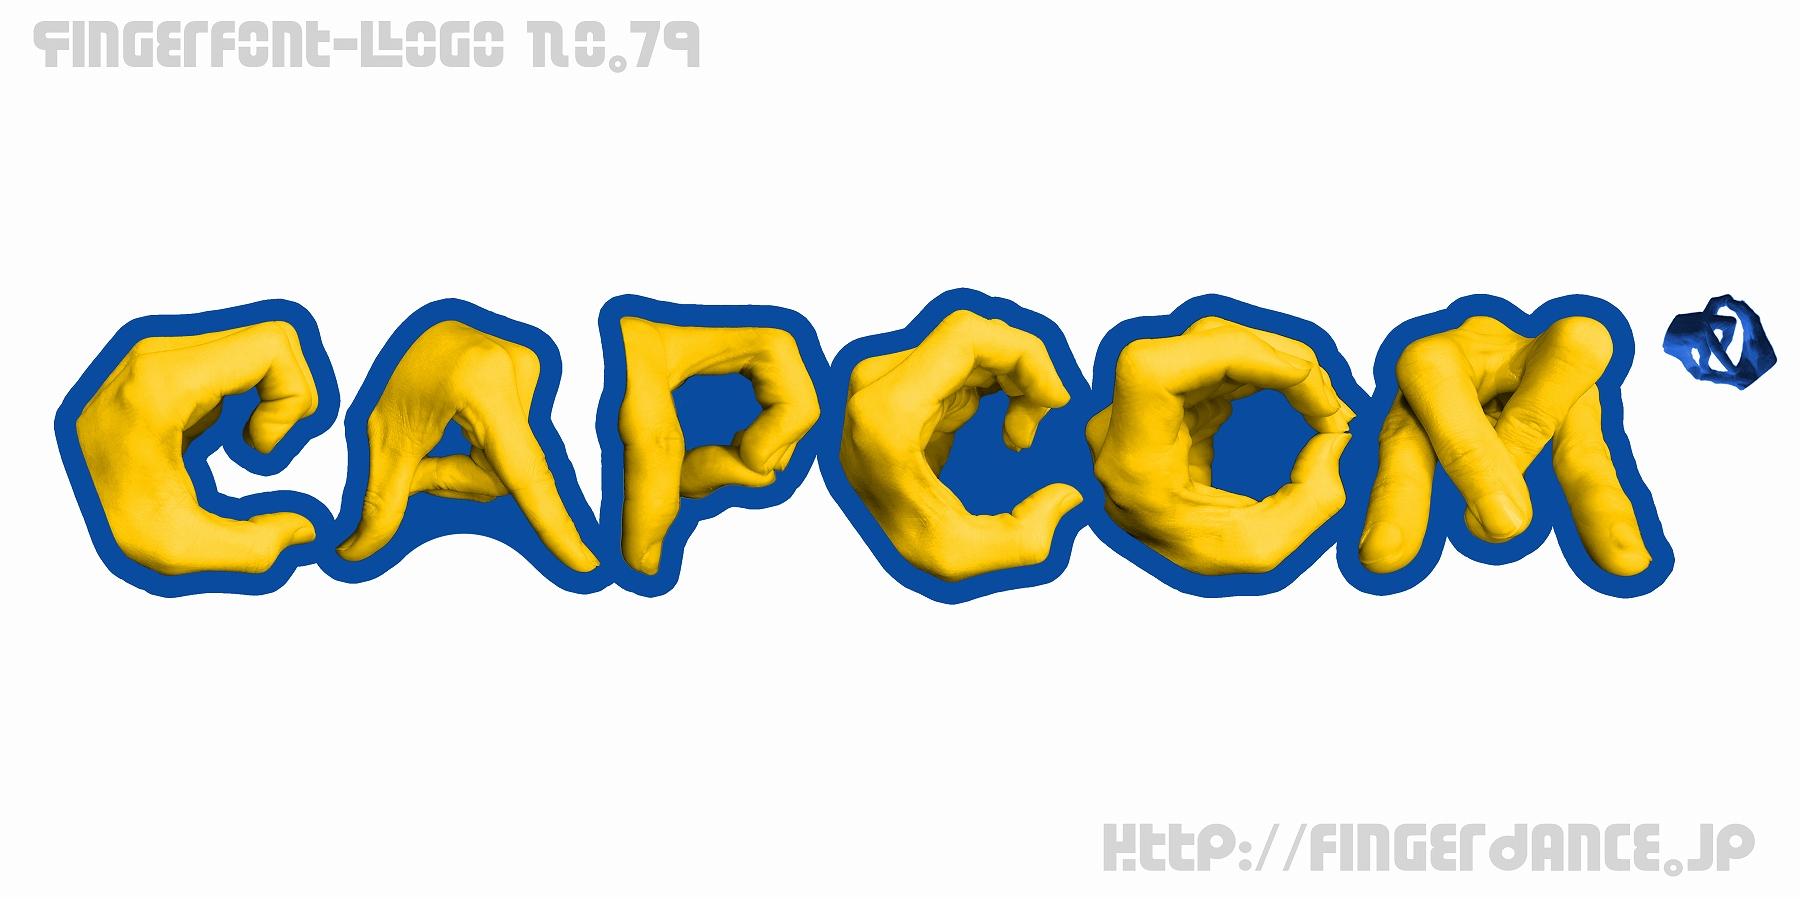 Capcom-fingerlogohand カプコン・フィンガーロゴハンド手指